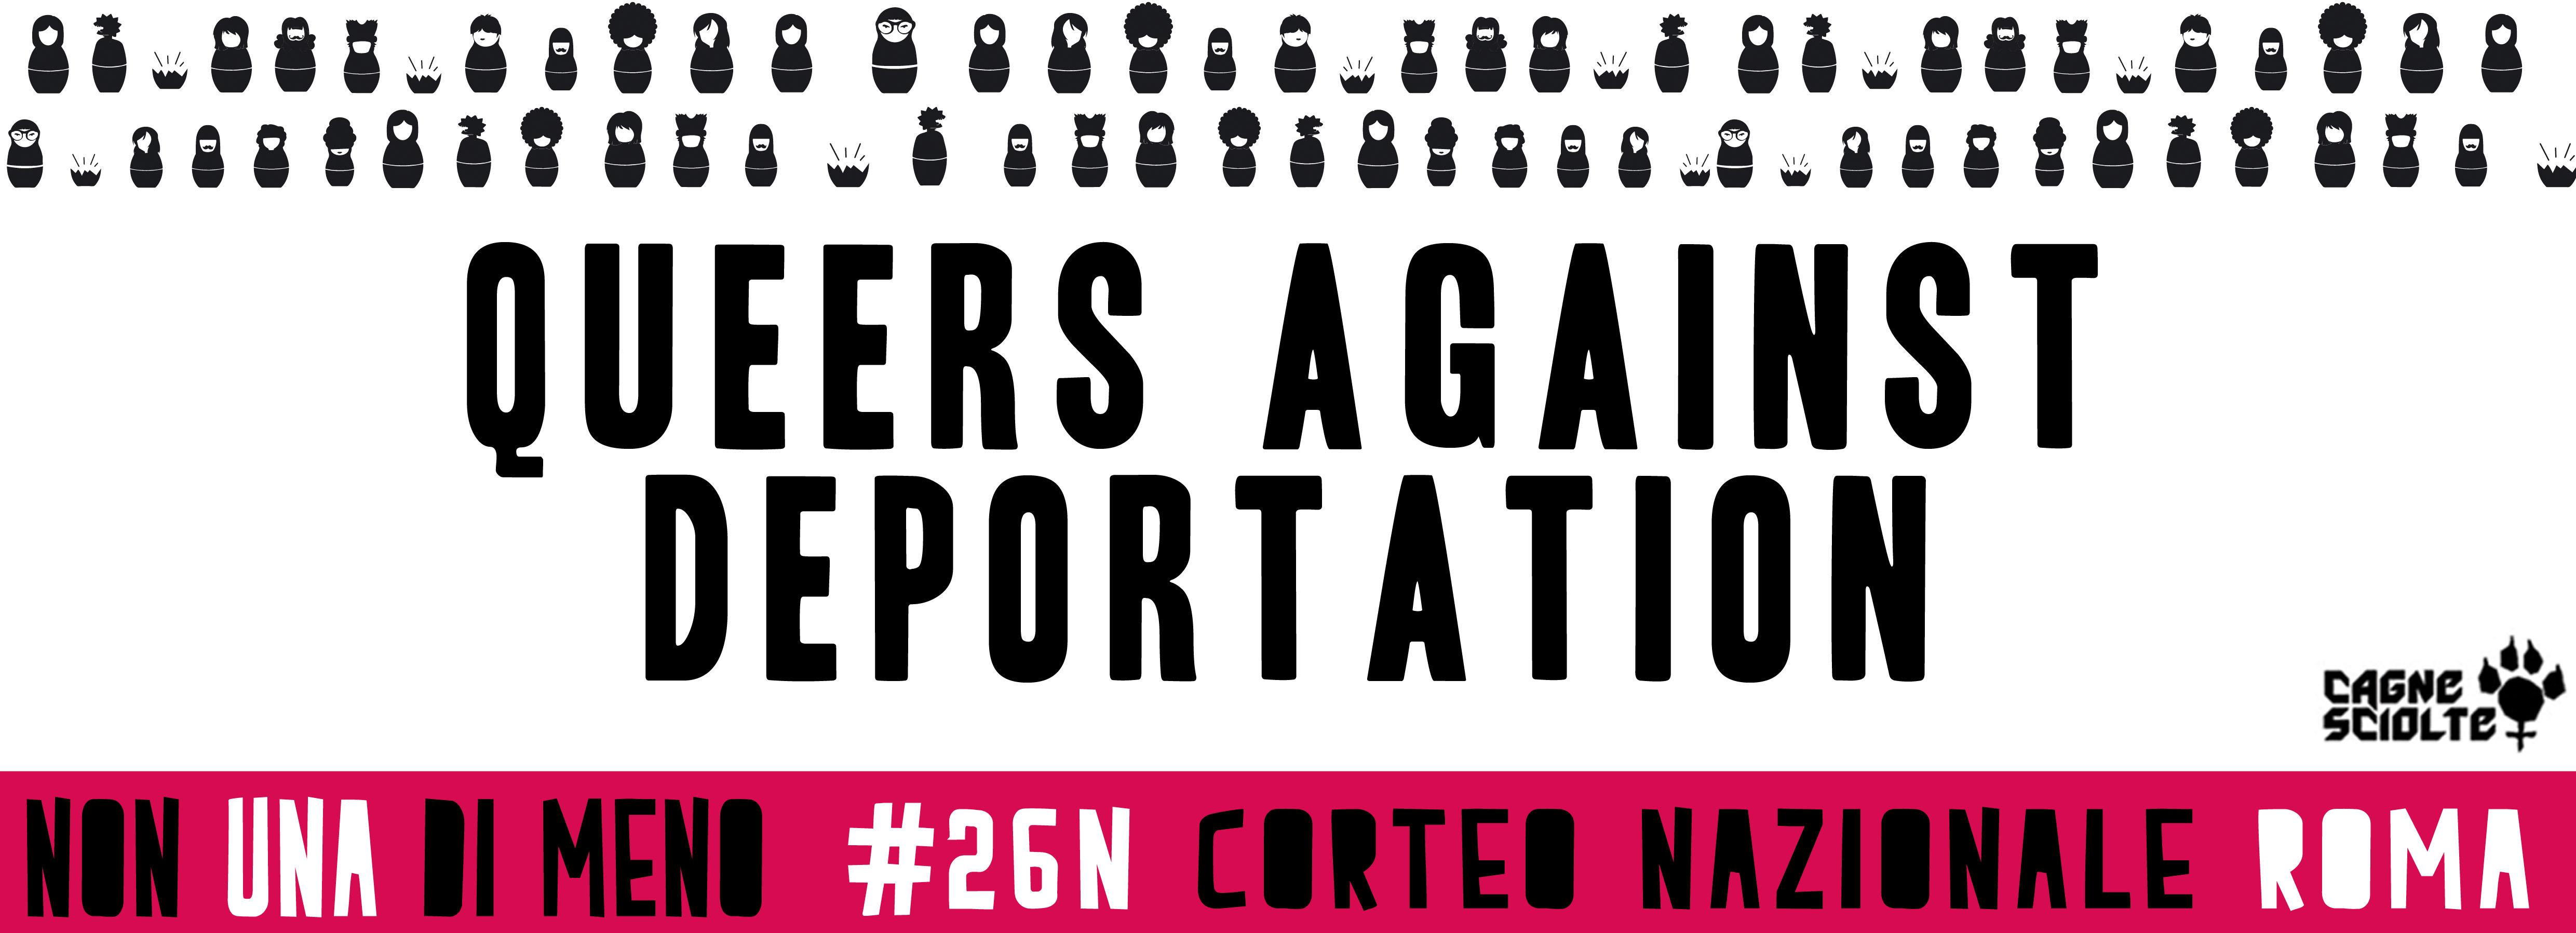 queers-vs-deportation-copia